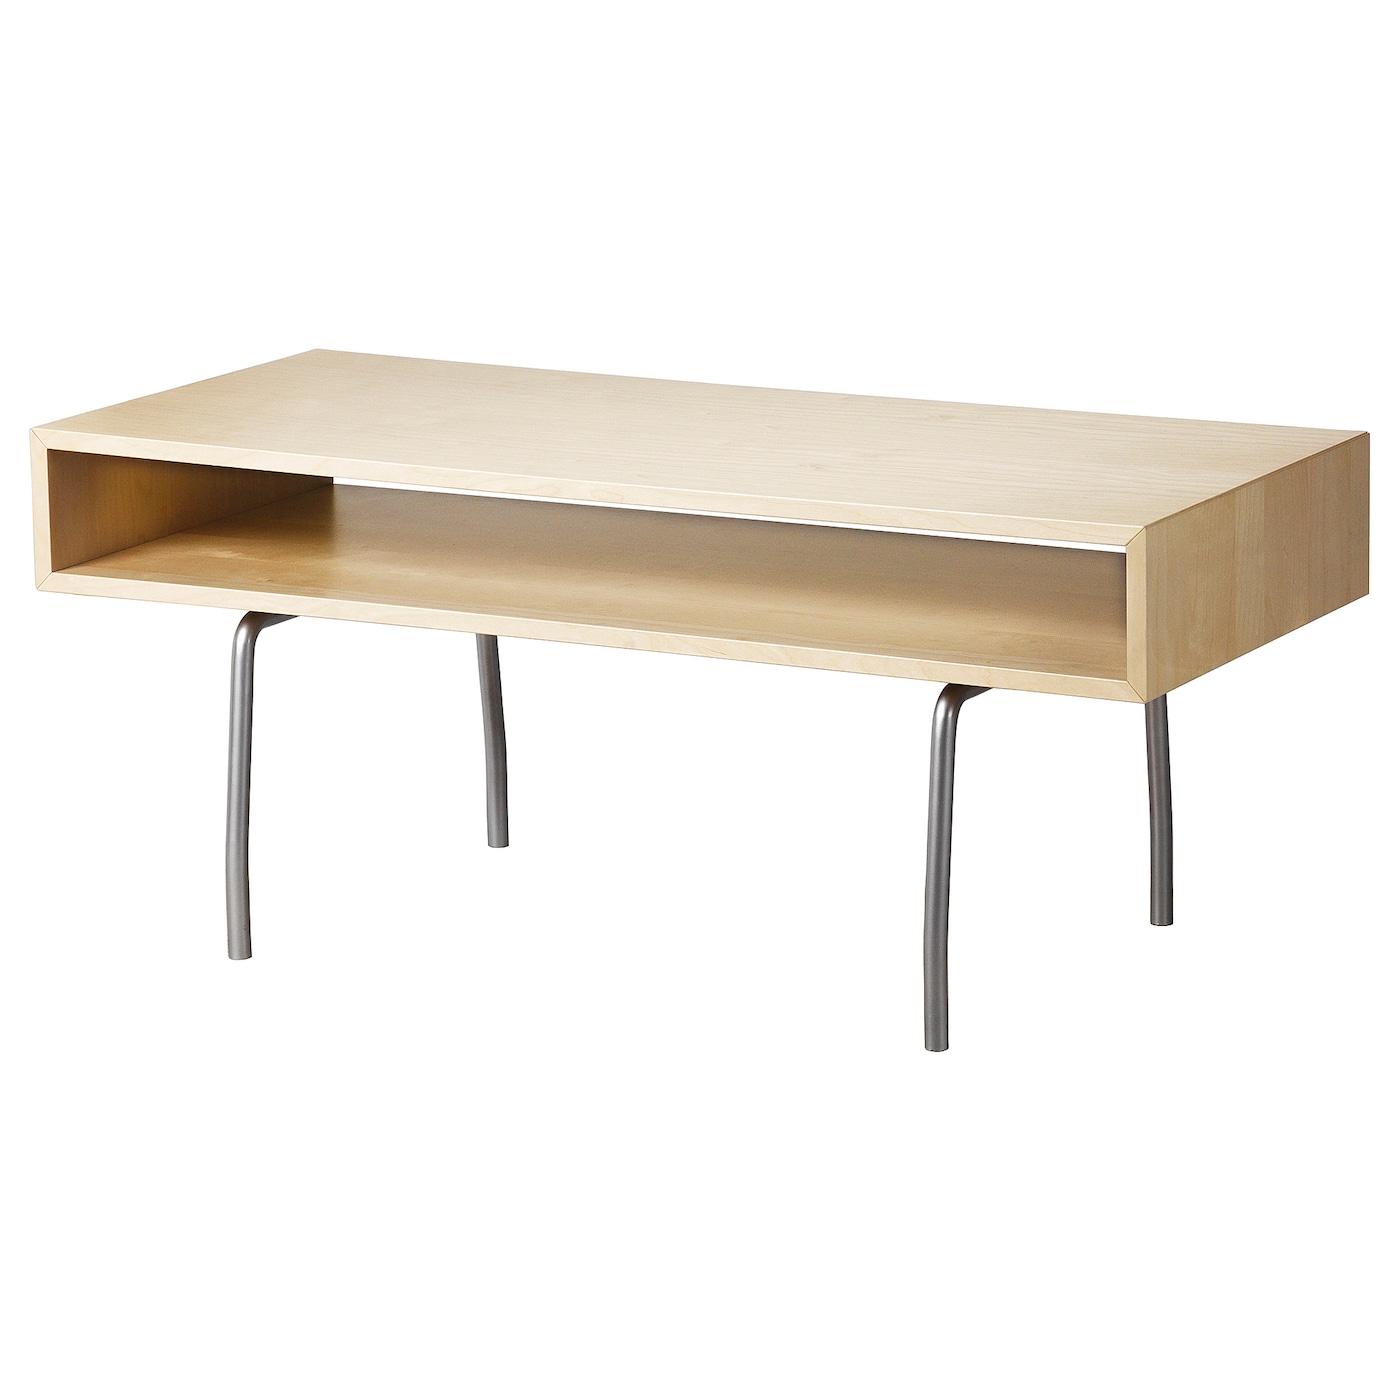 Couchtisch Coffeetable Hampton Weiss Rattan: Rattan & Wicker Chairs